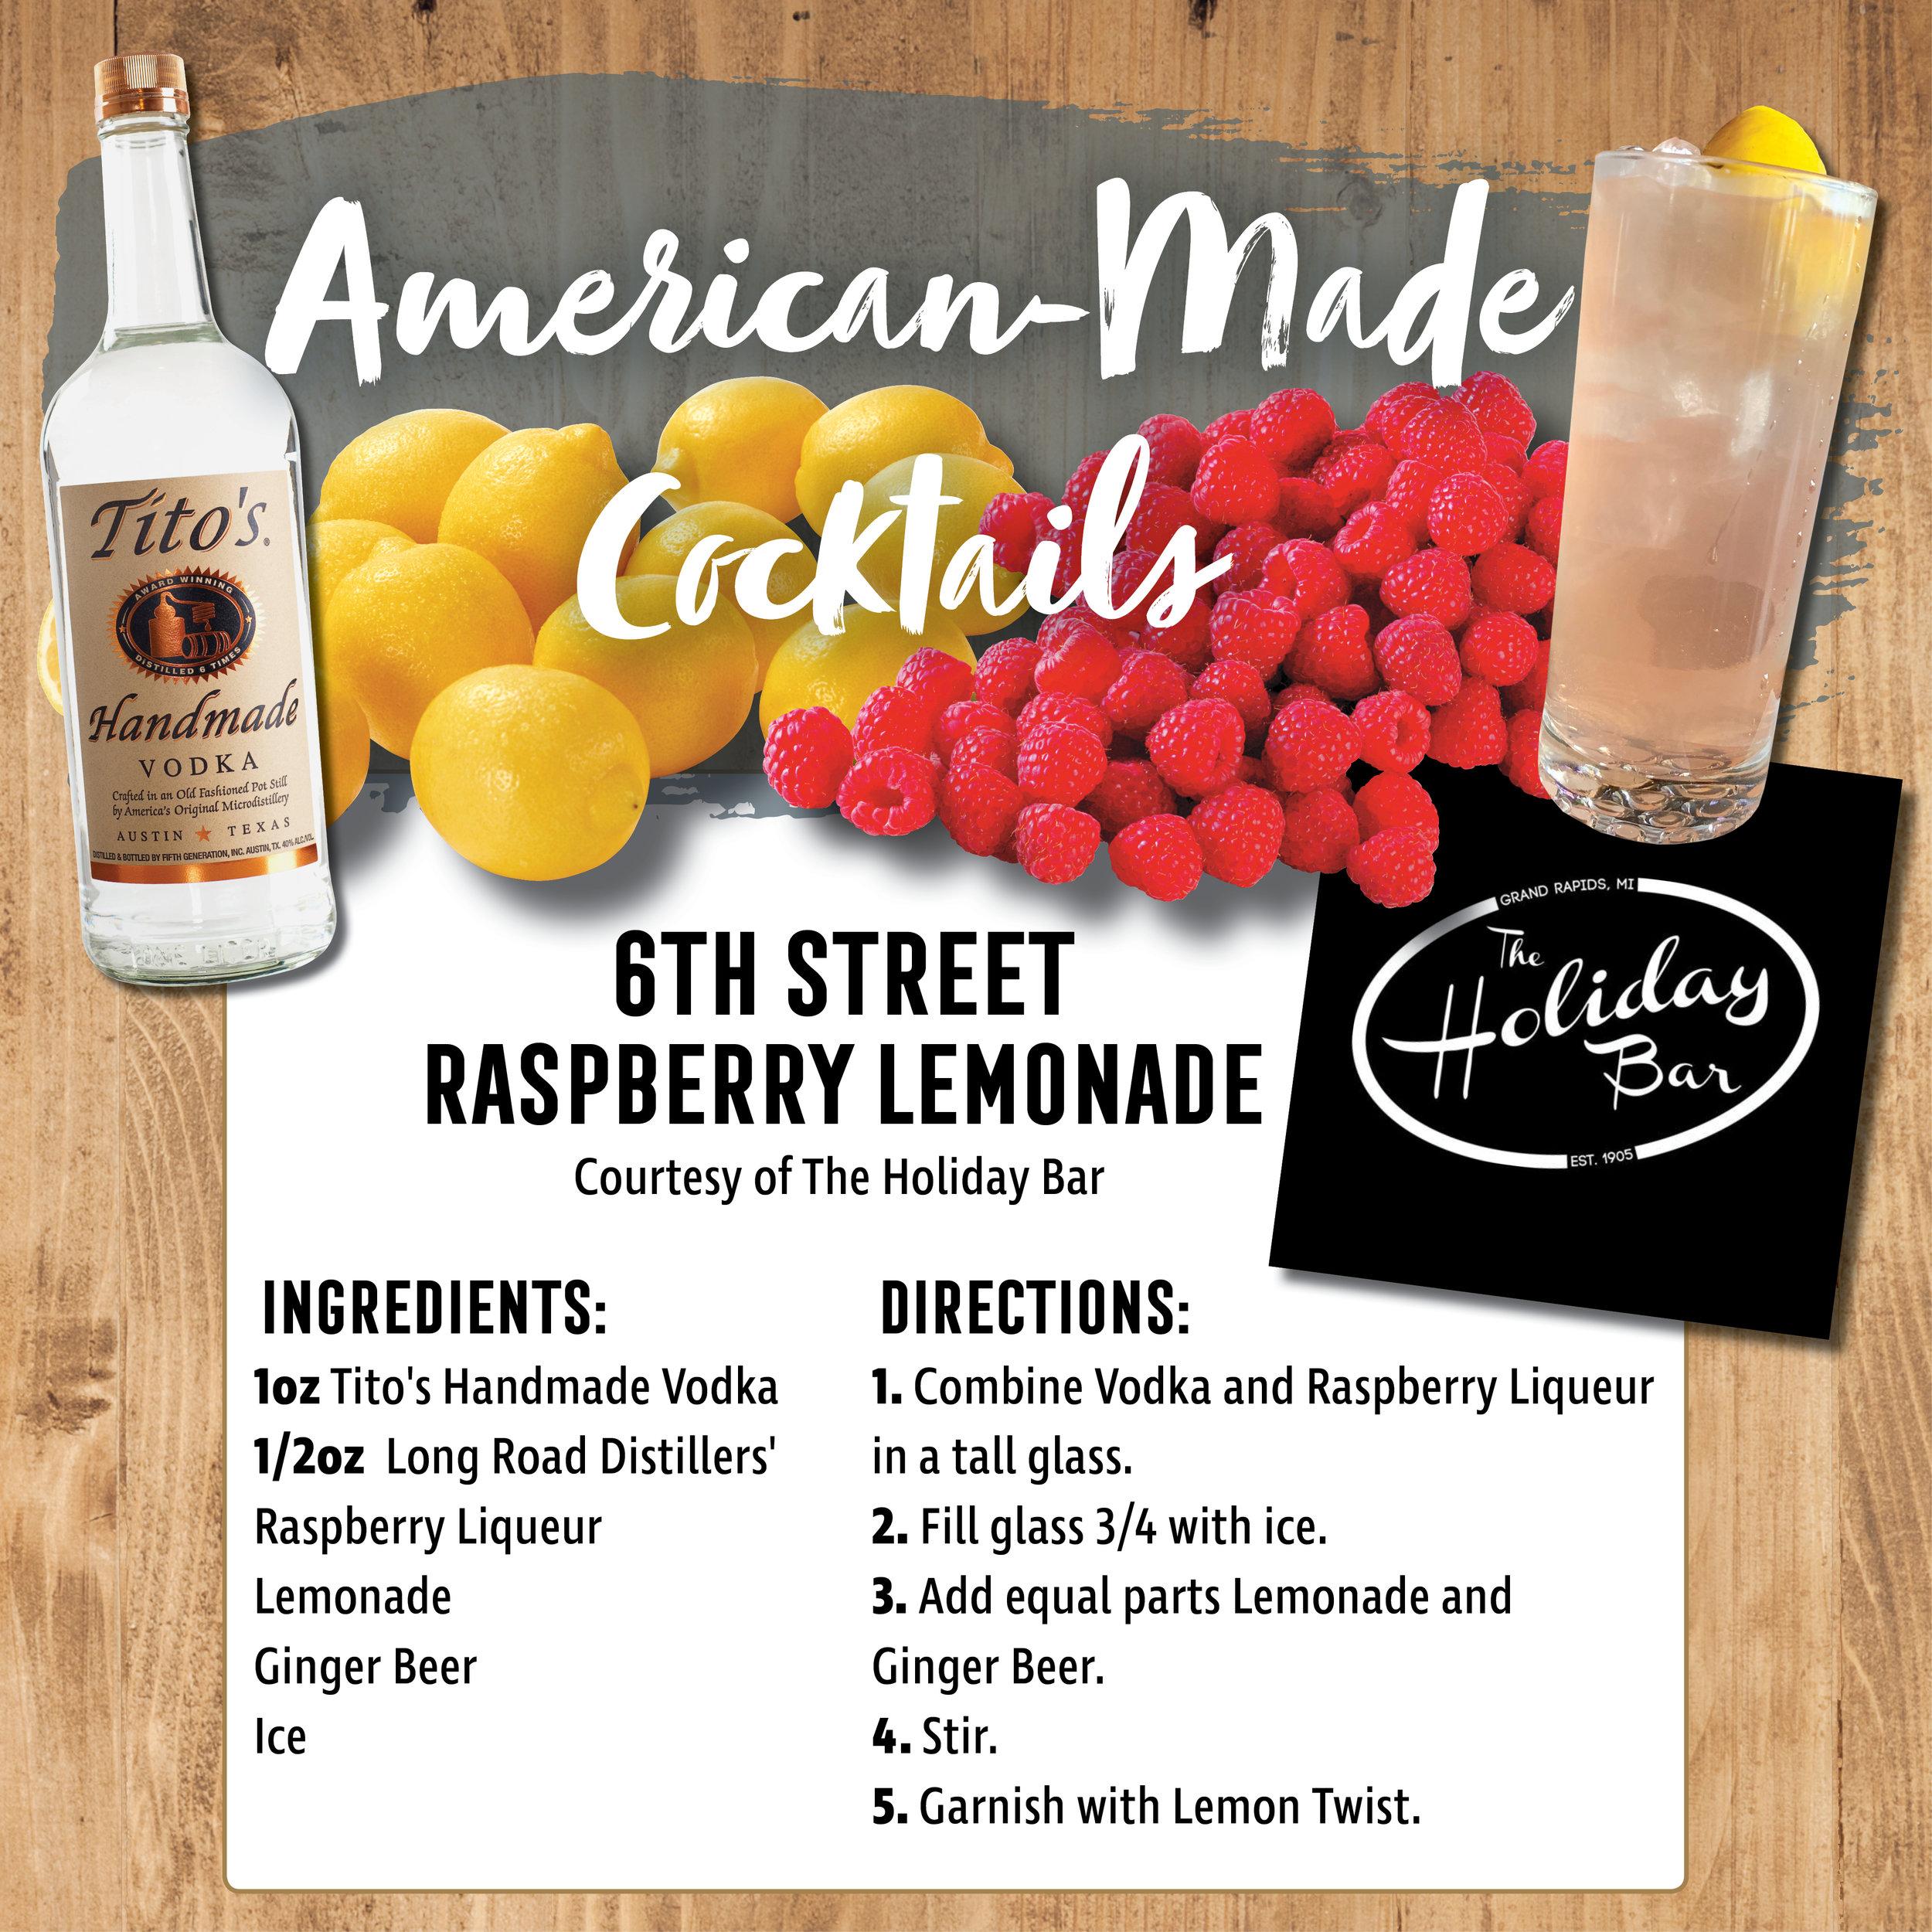 6th Street Raspberry Lemonade Holiday Bar.jpg